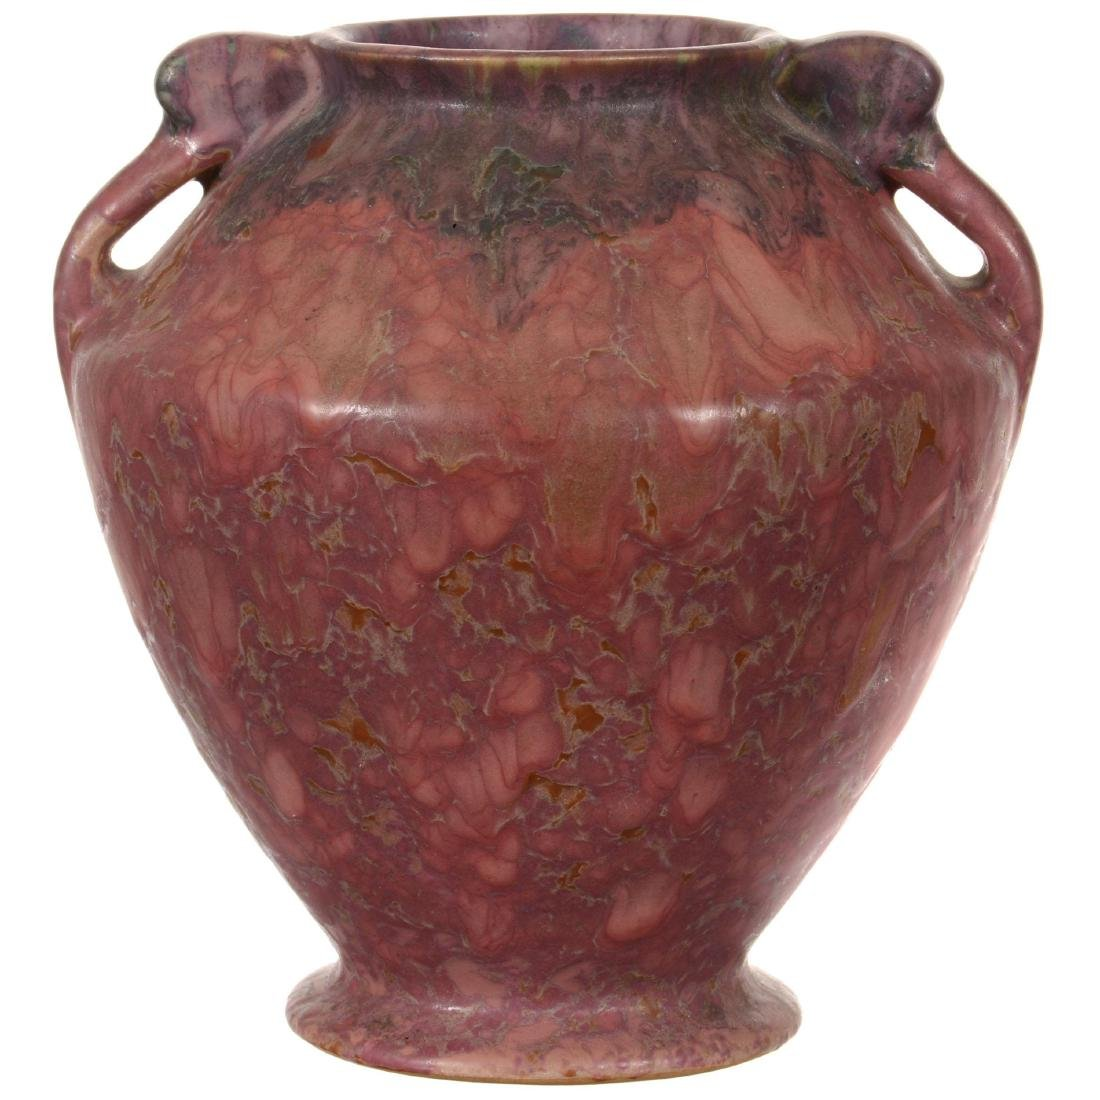 Unmarked Roseville Art Pottery Vase